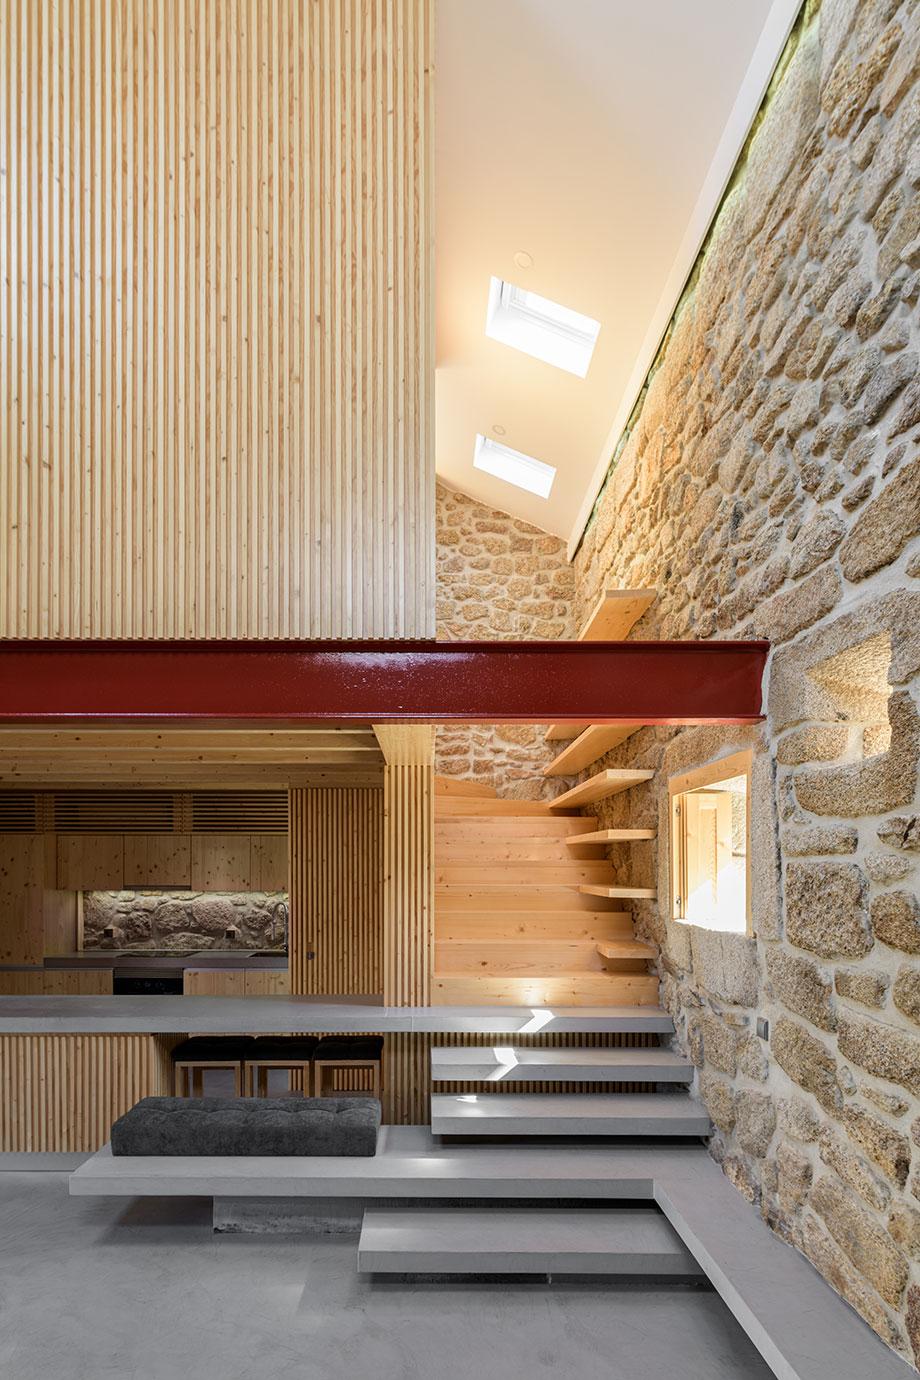 casa rural en portugal de hbg architects (7) - foto ricardo oliveira alves